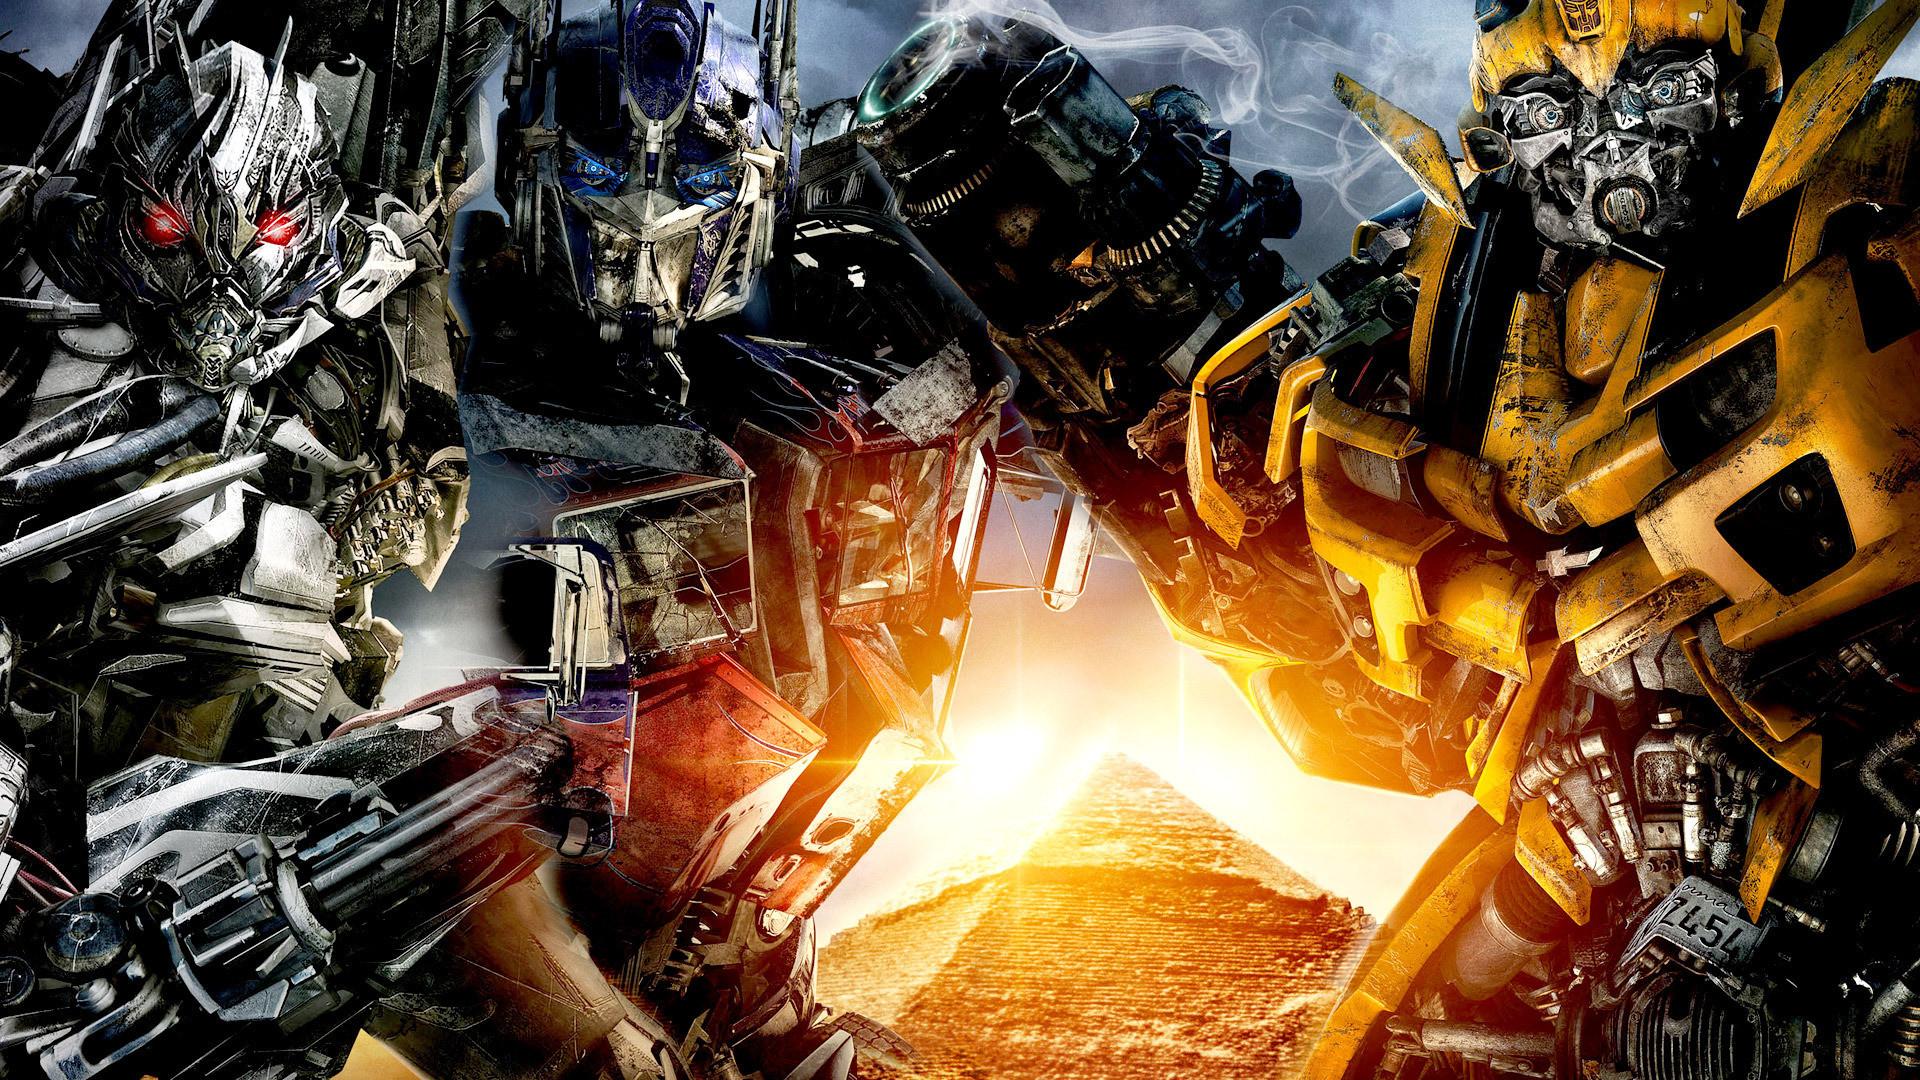 Bumble Bee Optimus Prime Transformers Wallpaper HD.